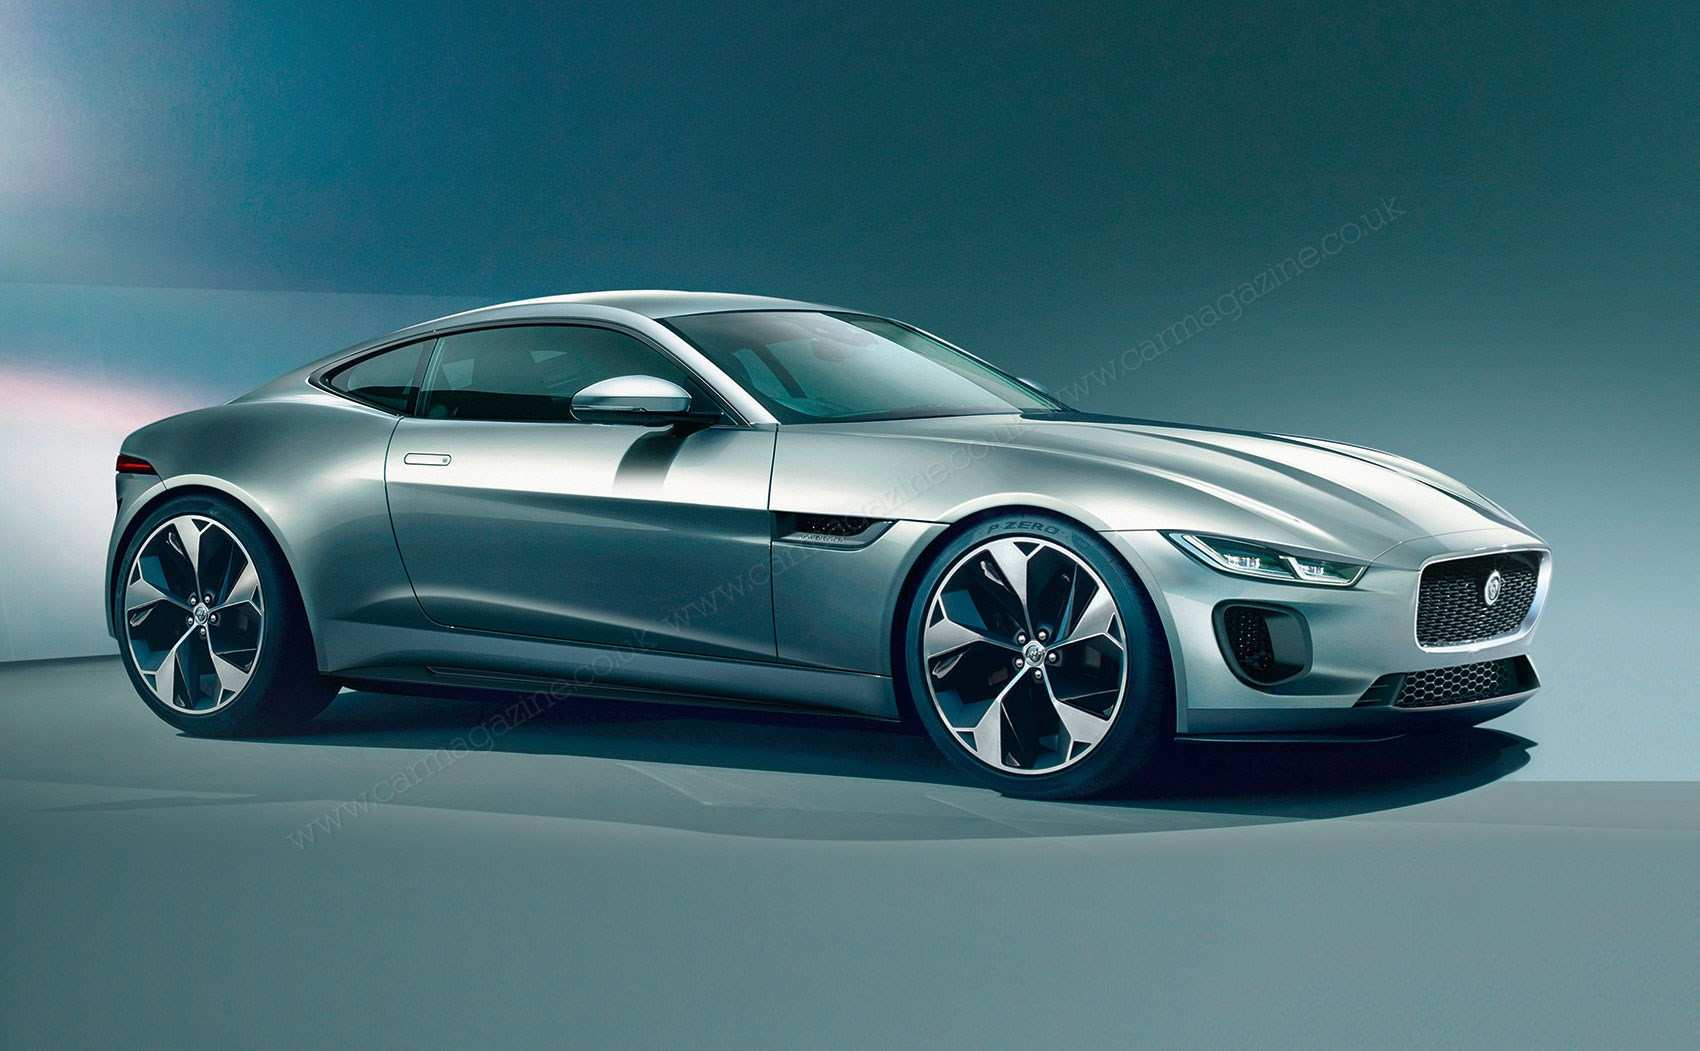 43 Great 2020 Jaguar F Type Convertible Spesification by 2020 Jaguar F Type Convertible